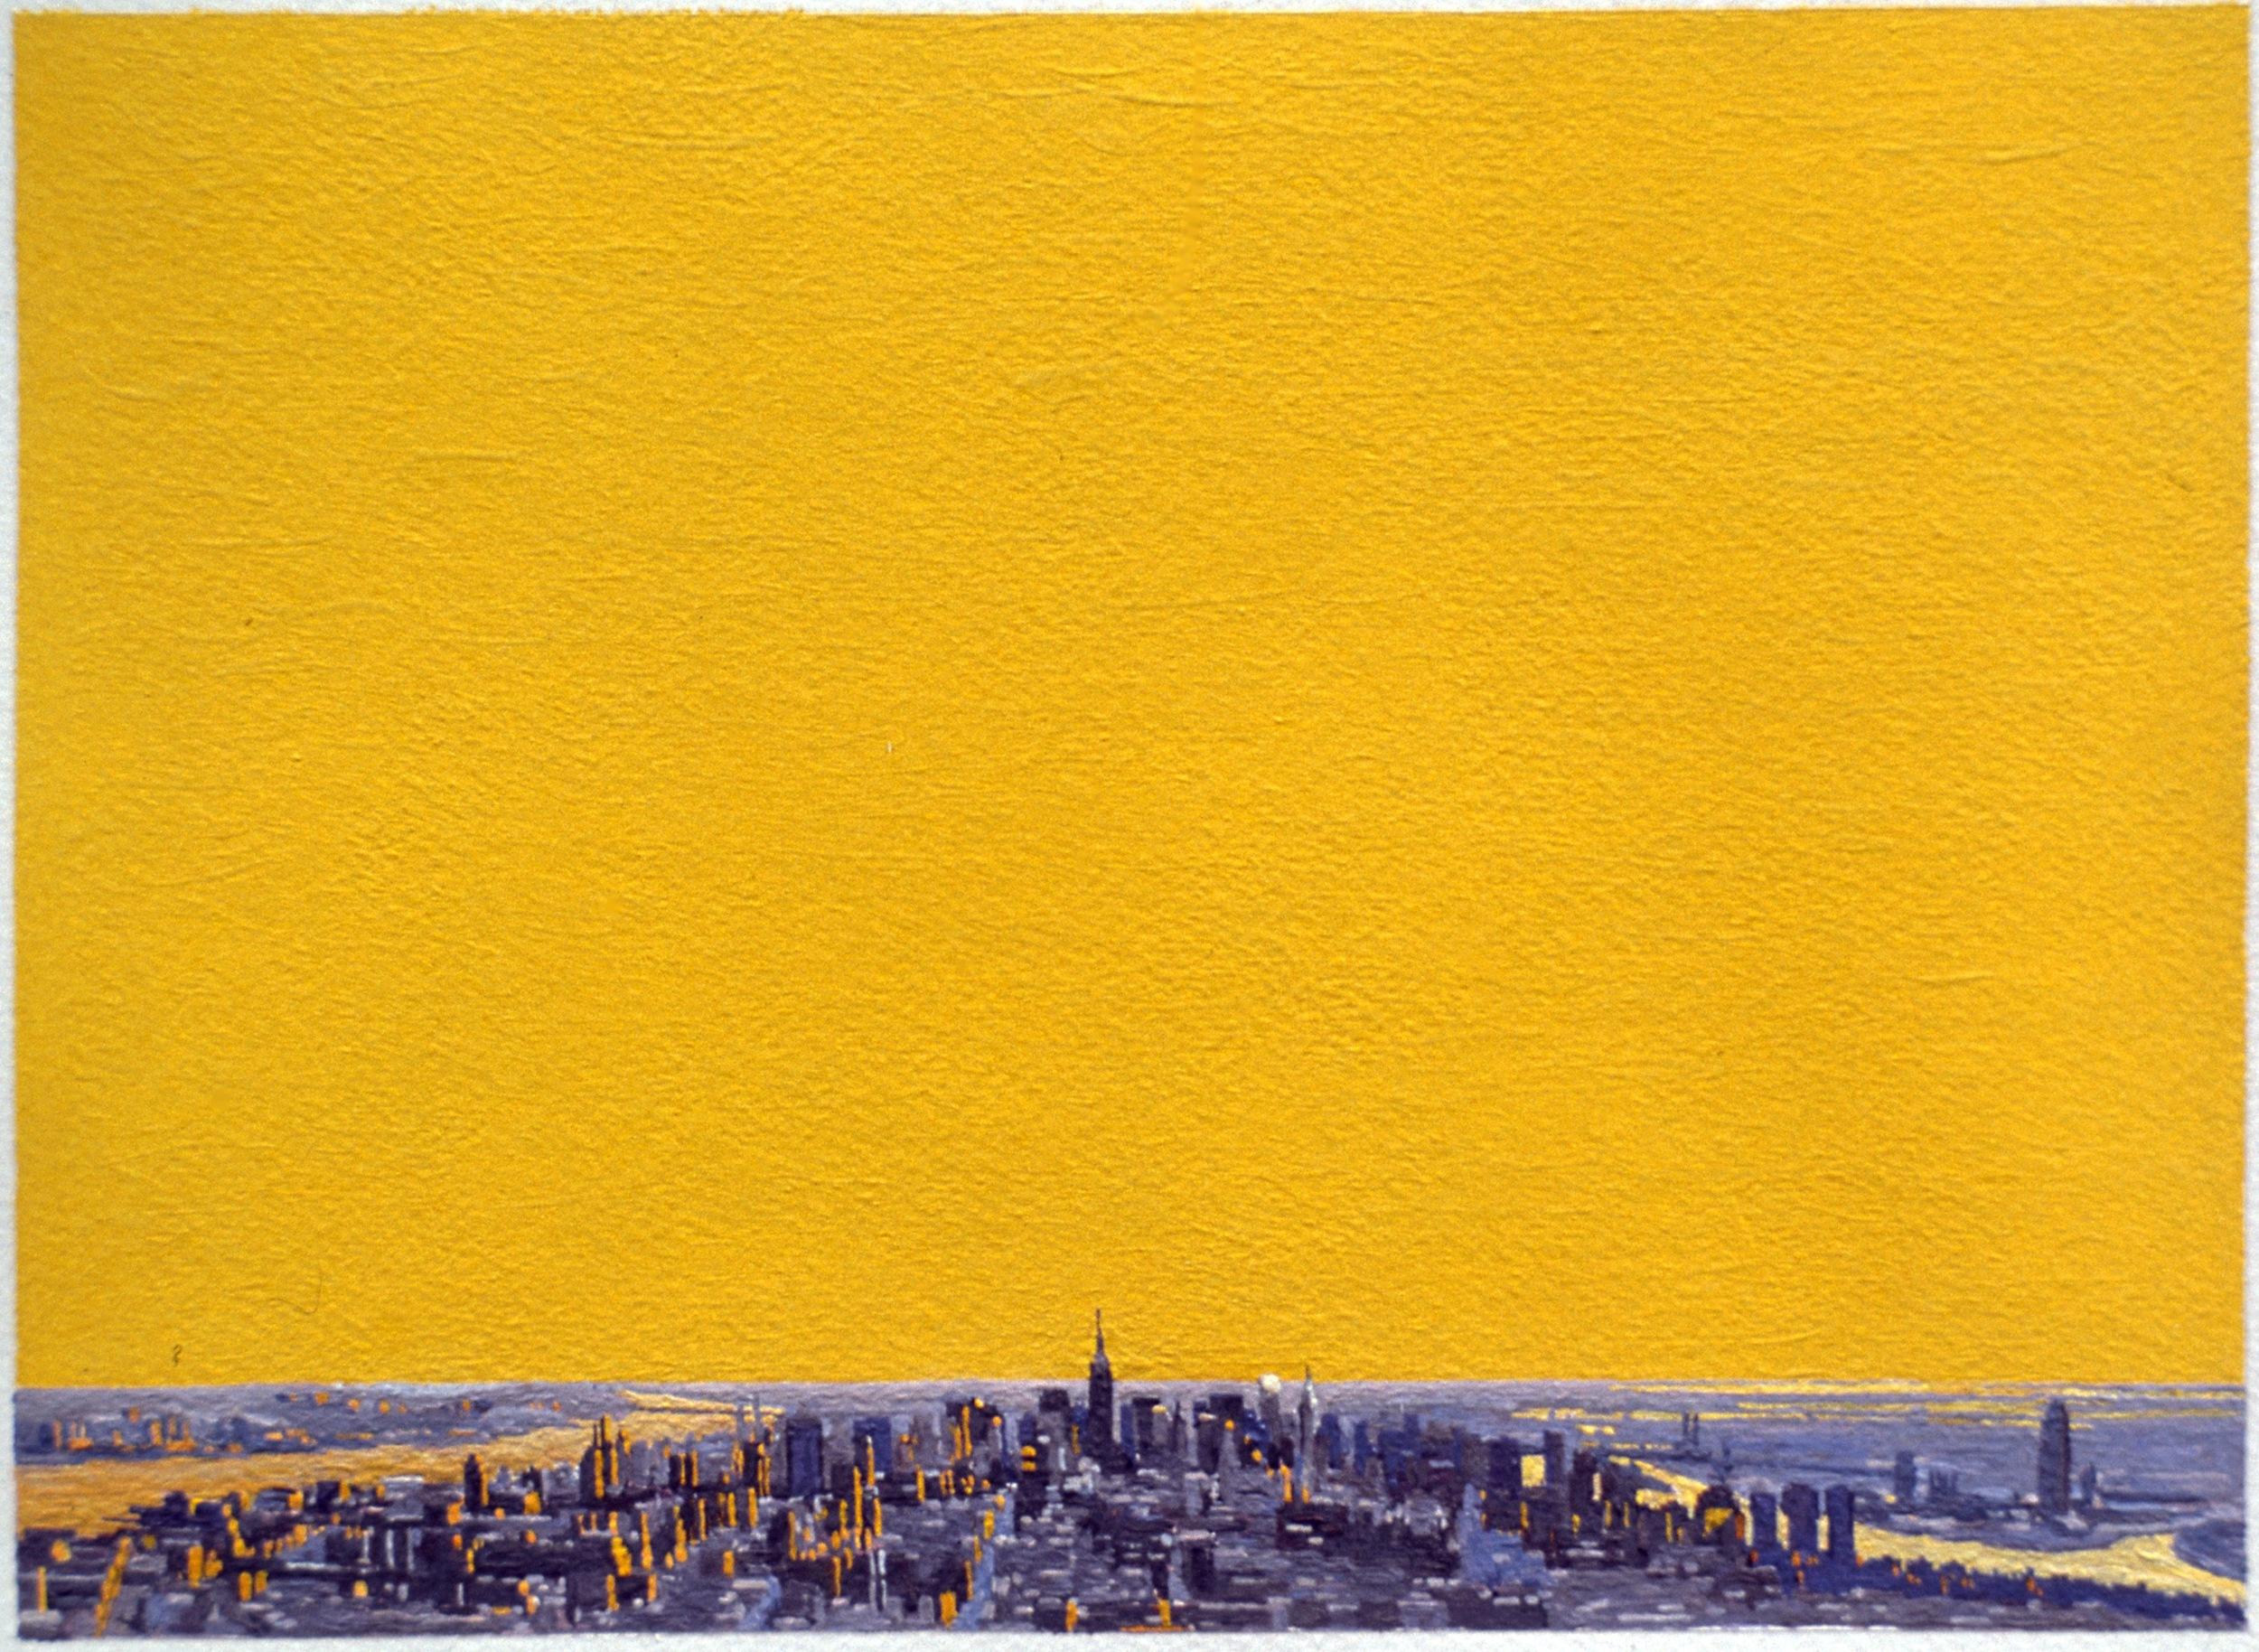 Manhattan VI, 1998, oil on paper, 8 x 11 inches